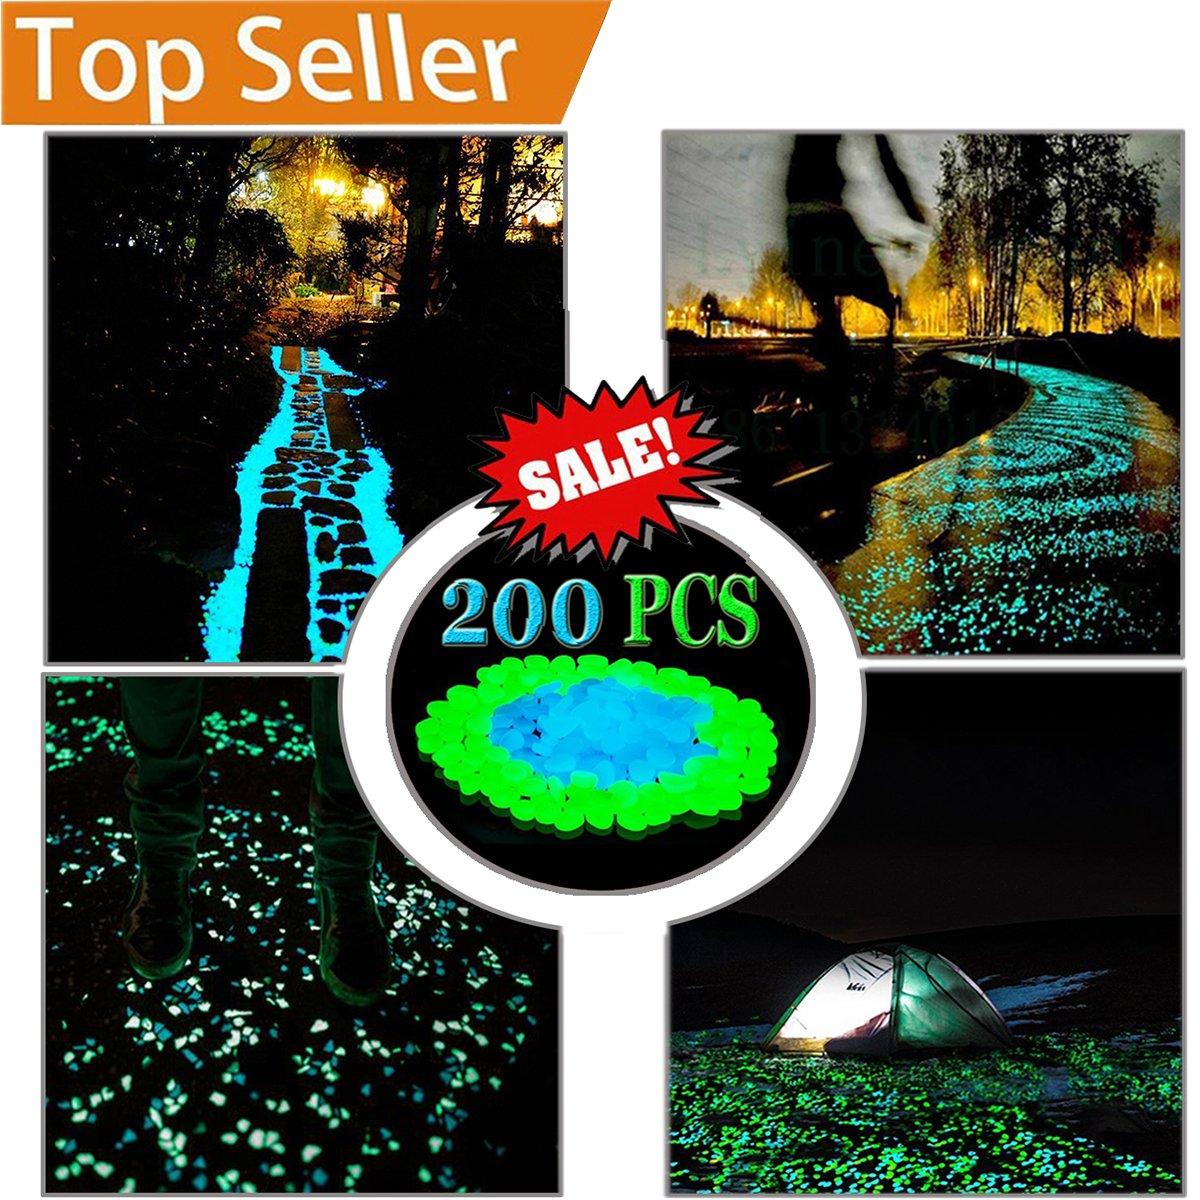 LLOP 200Pack Glow in the Dark Garden Pebbles for Walkways Outdoor Decor Aquarium Fish Tank Path Lawn Yard, Glow Stone Rocks Outdoor Garden Decorative Stones in Blue & Green